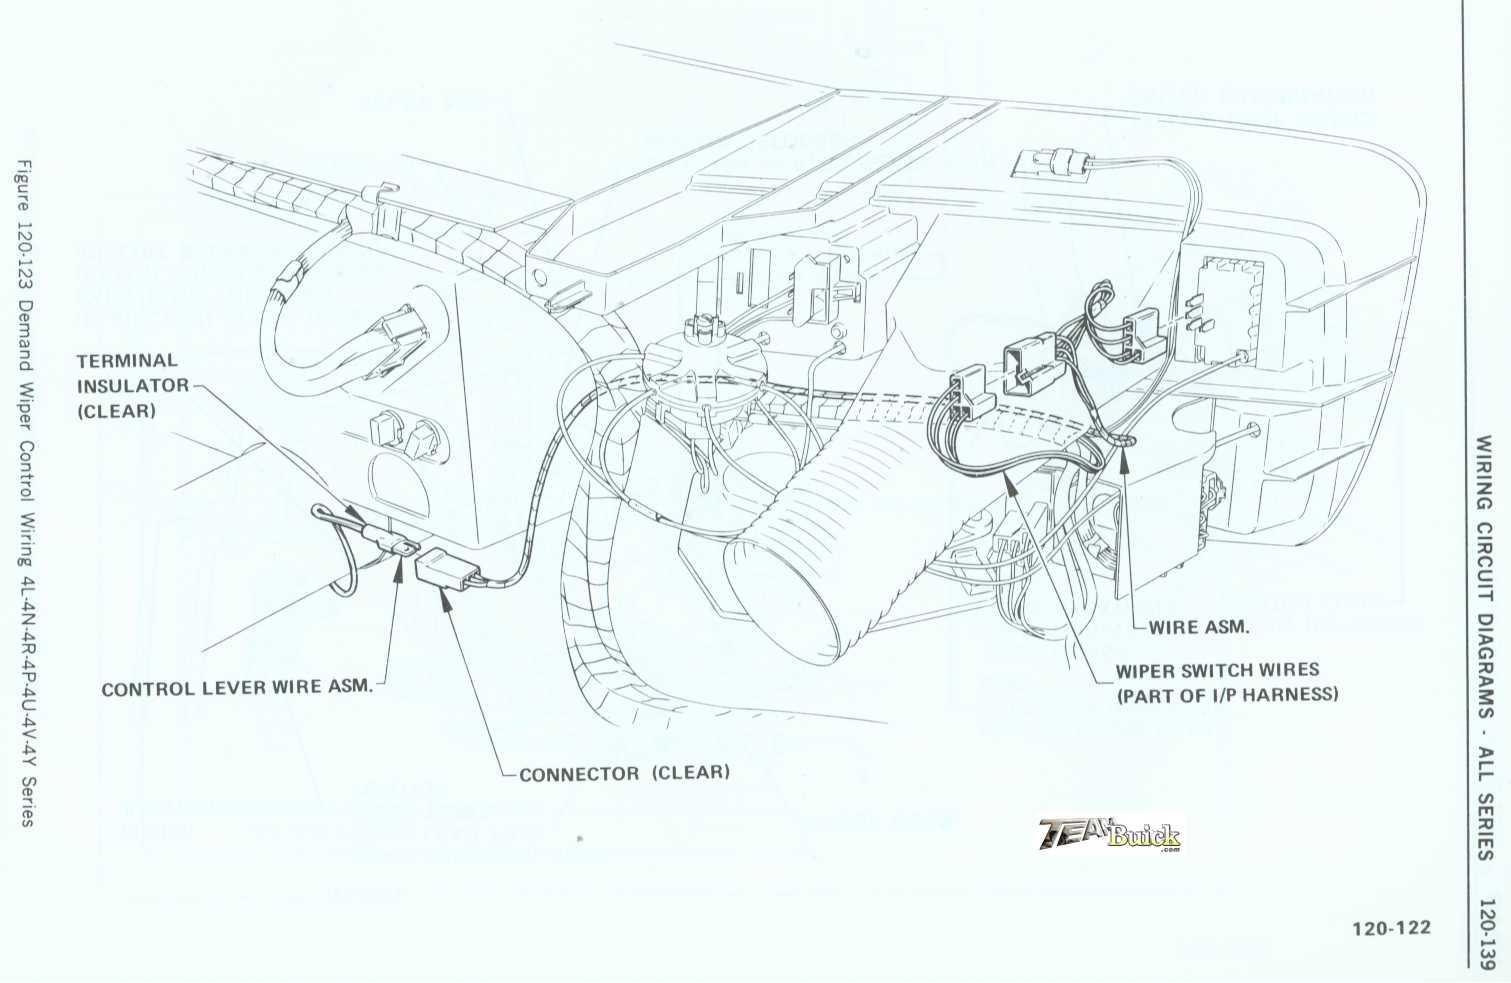 1972 Buick, Demand Wiper Control Wiring 4L-4N-4R-4P-4U-4V